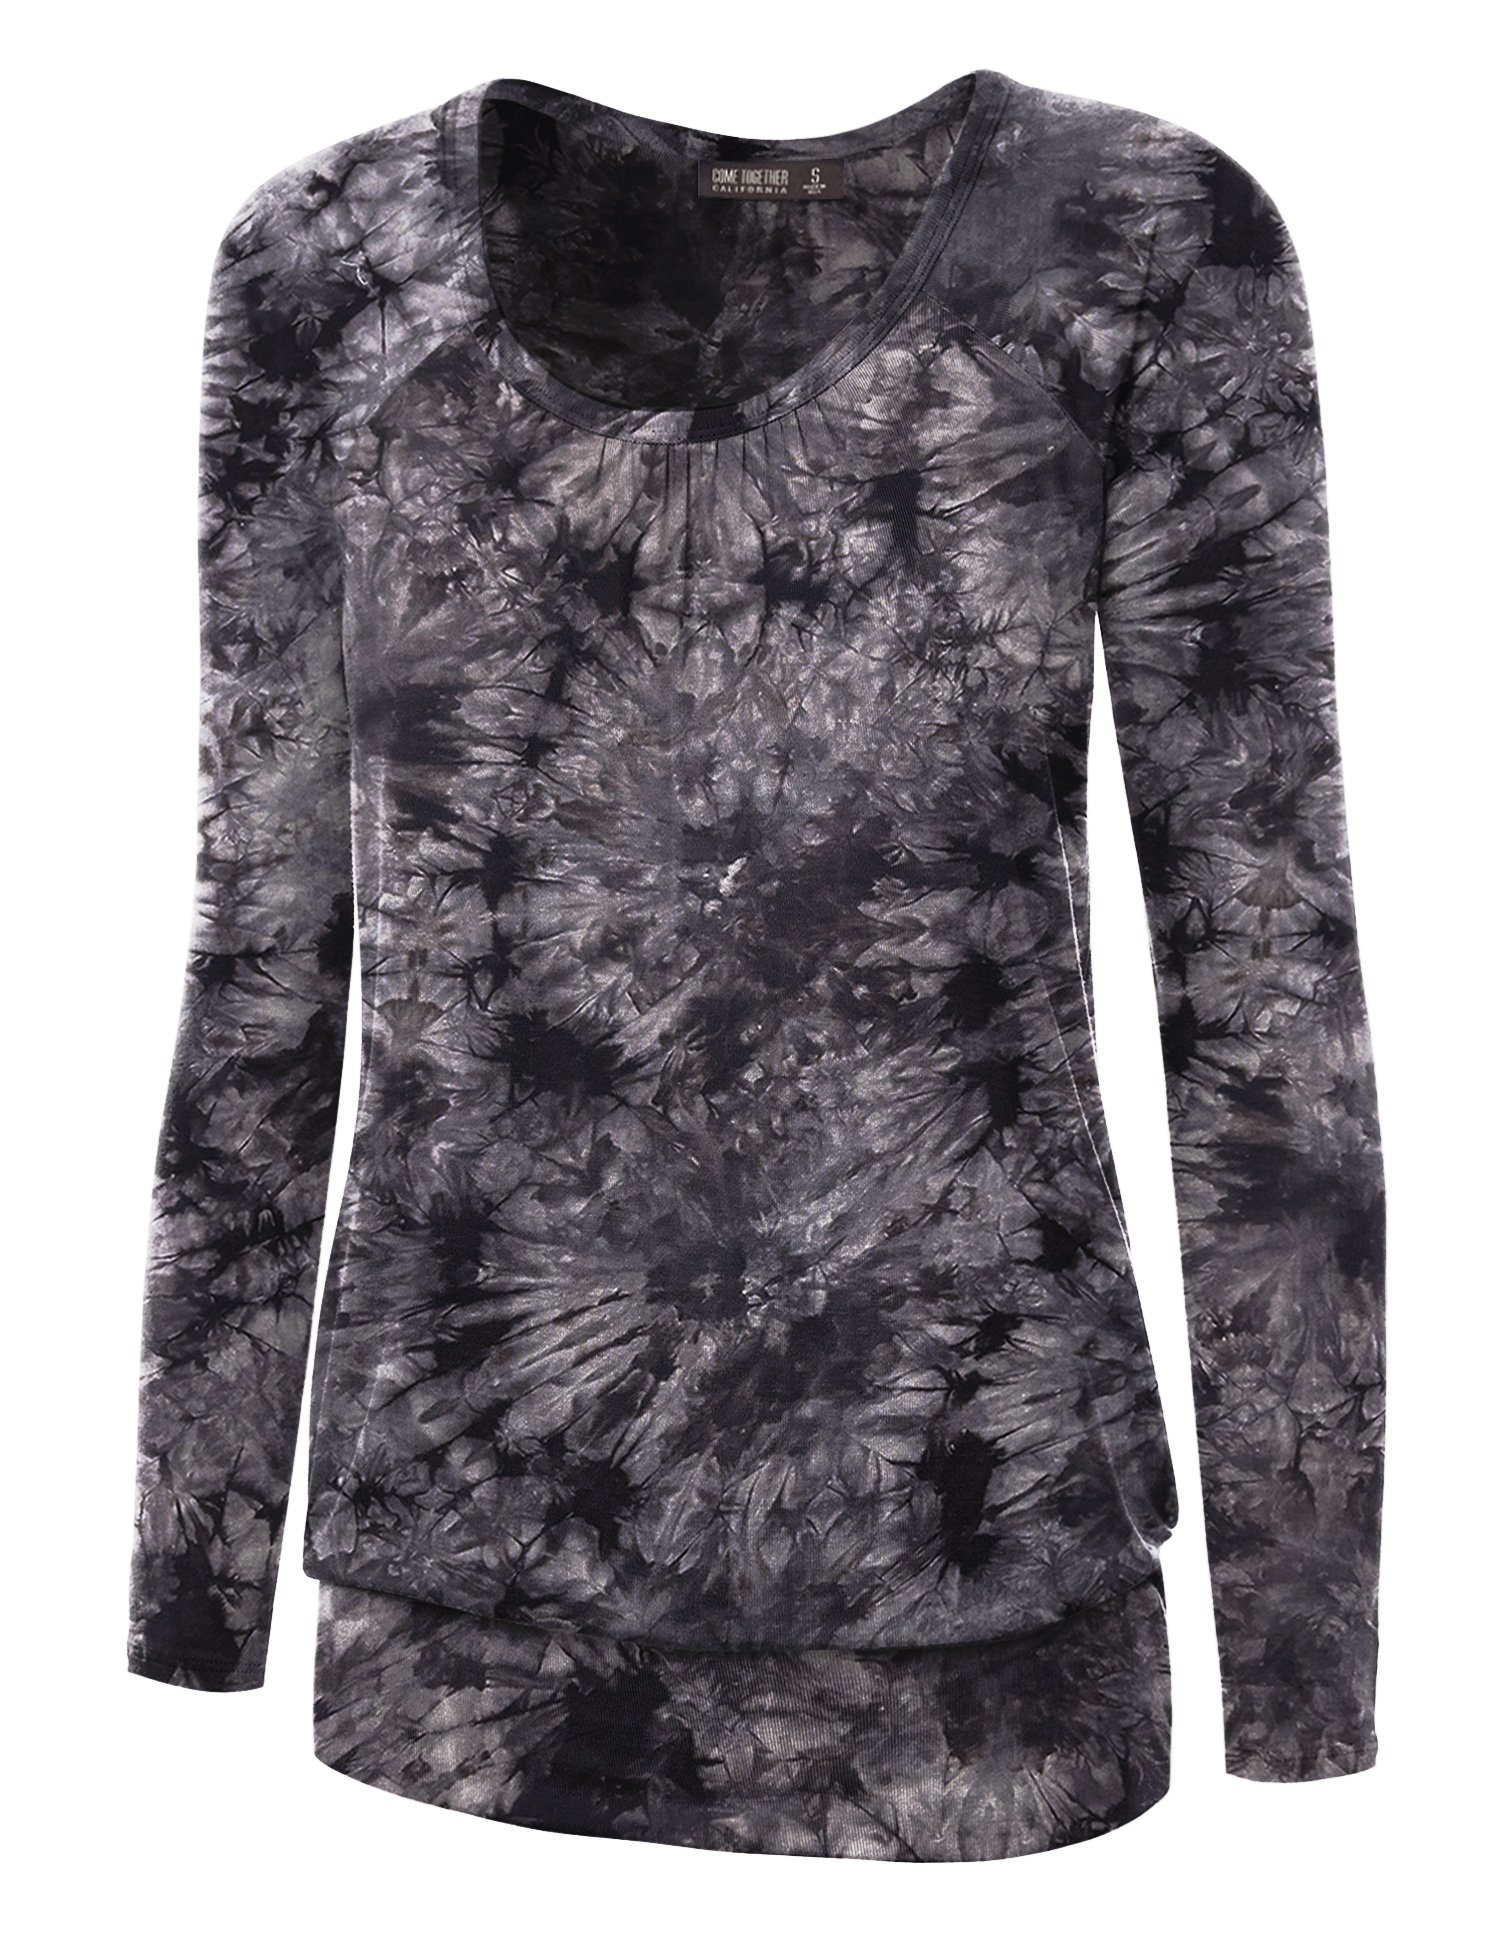 WT1164 Womens Tie-Dye Long Sleeve Front and Back Shirring Raglan Top XXXL BLACK